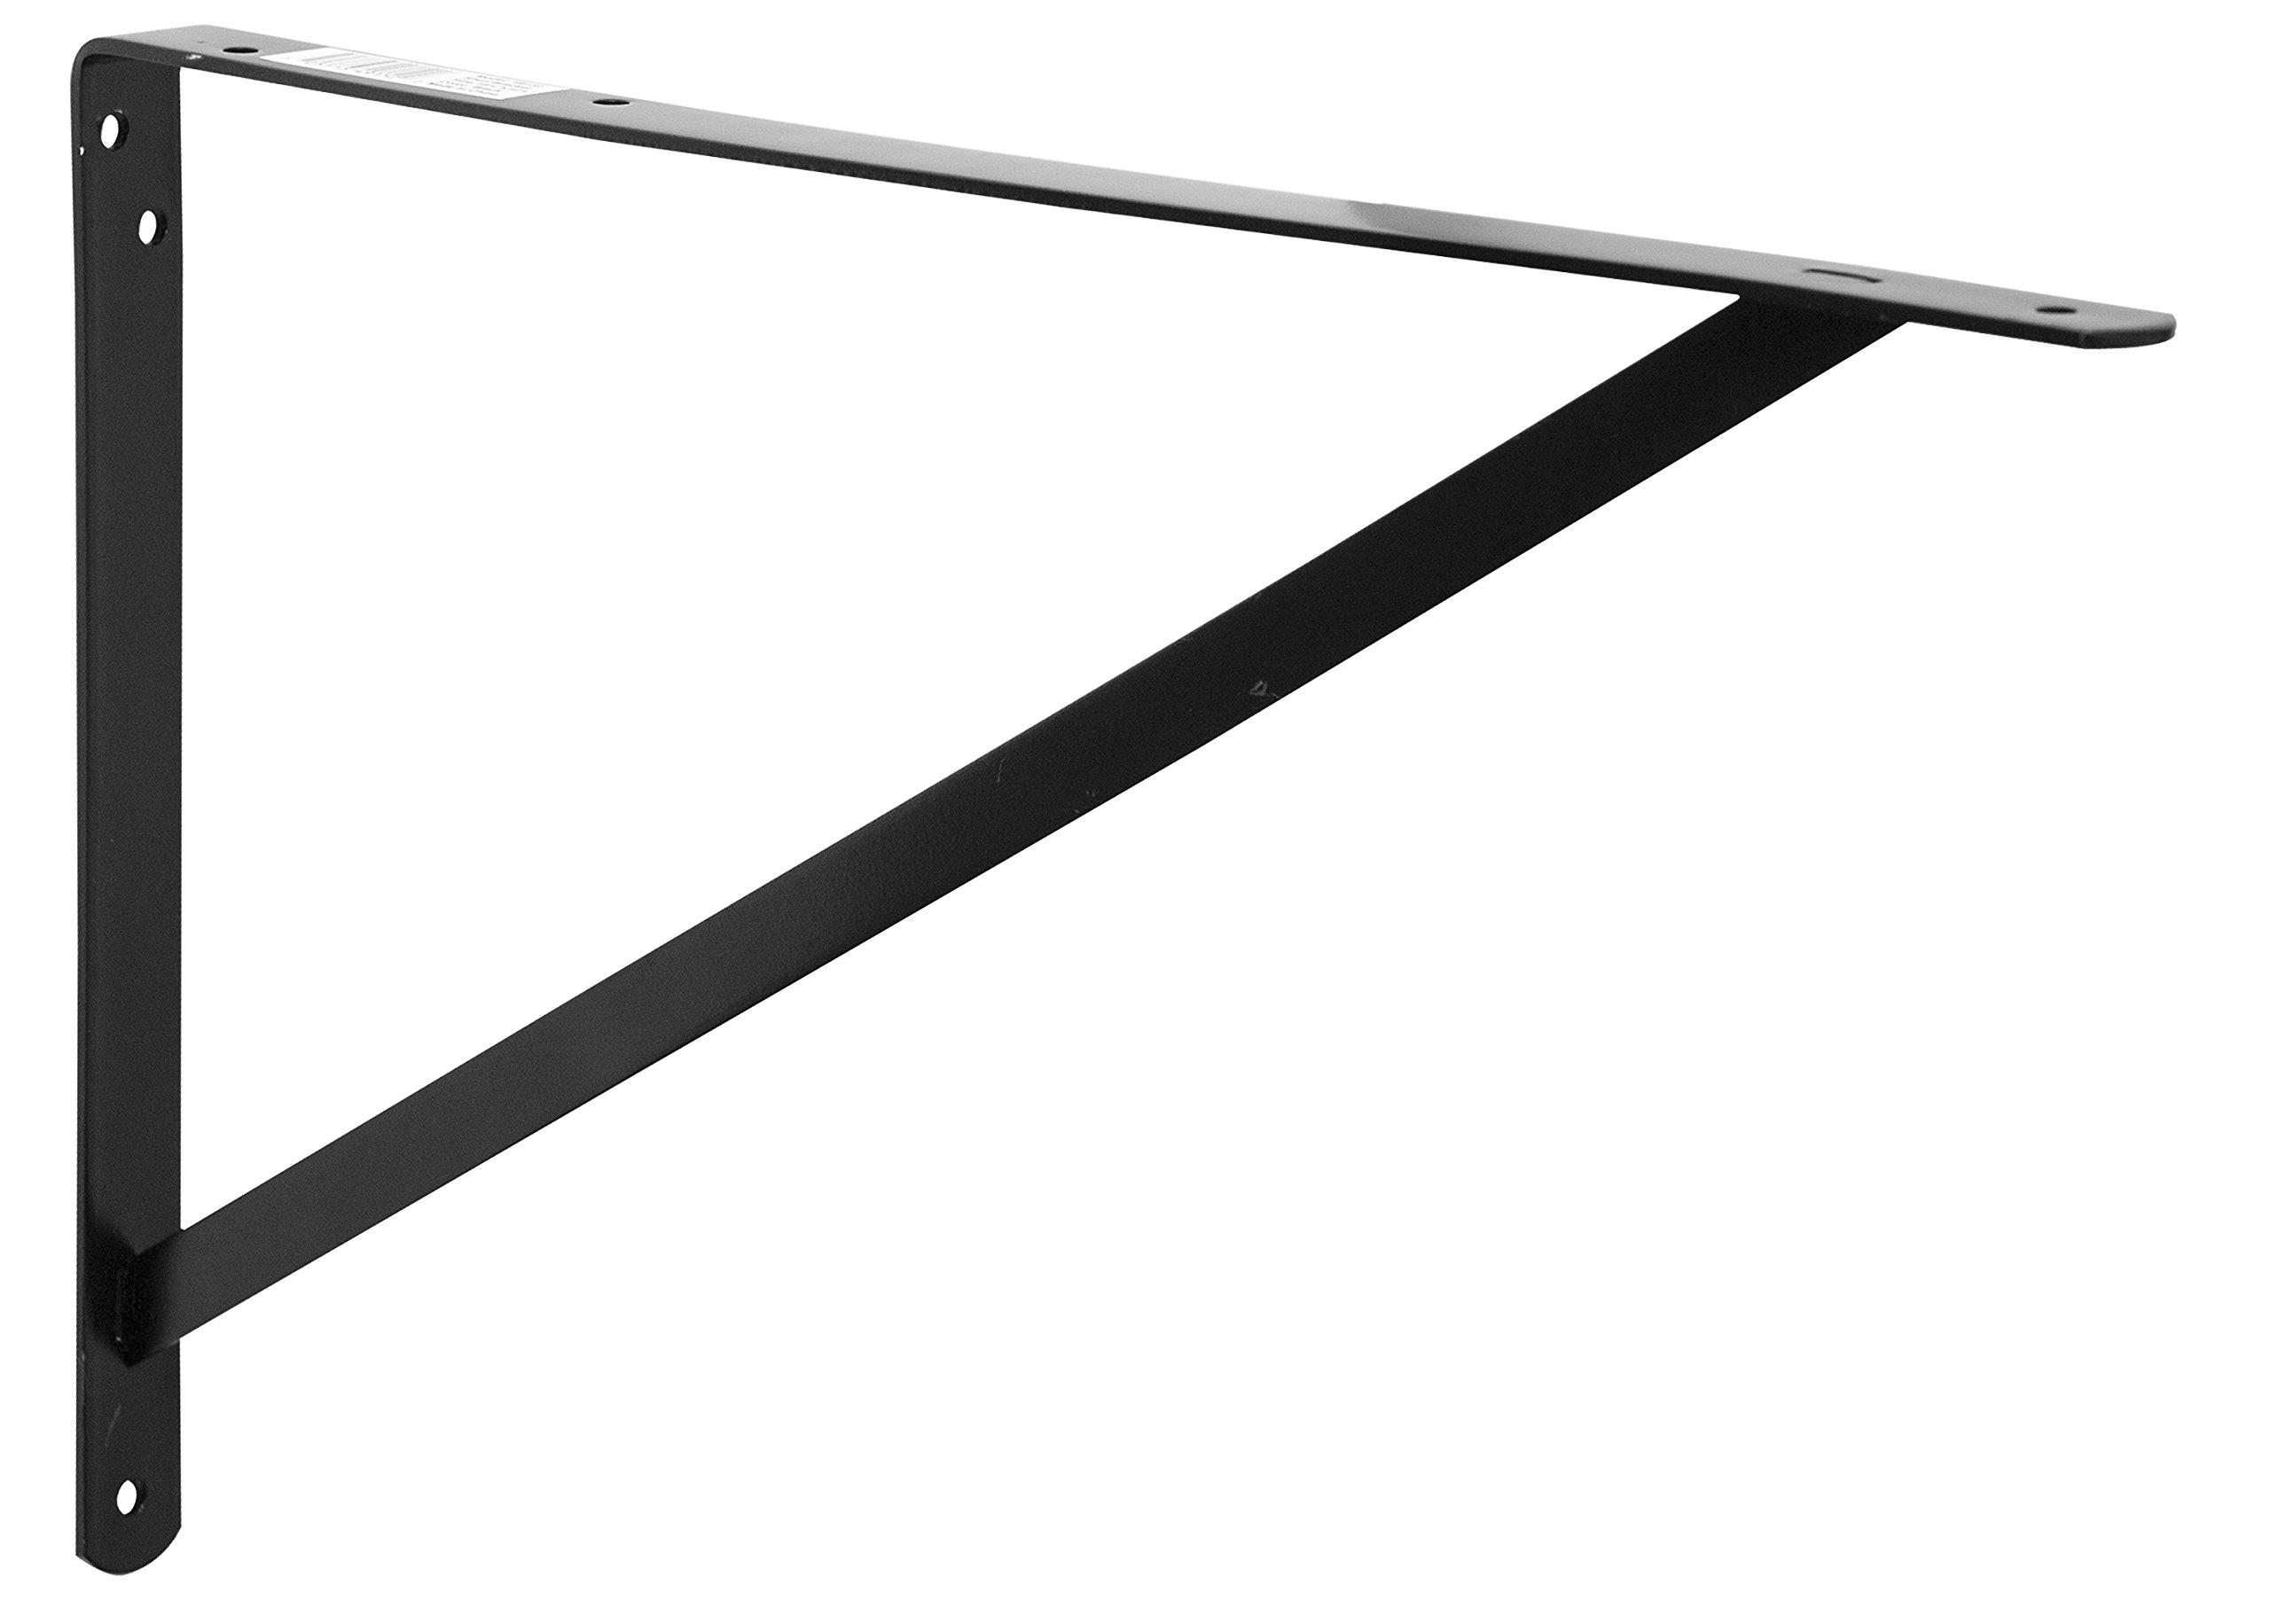 Decko 49152 Heavy Duty Shelf Bracket, 19.25-Inch by 12.50-Inch, Black, 10-Pack by Decko (Image #1)